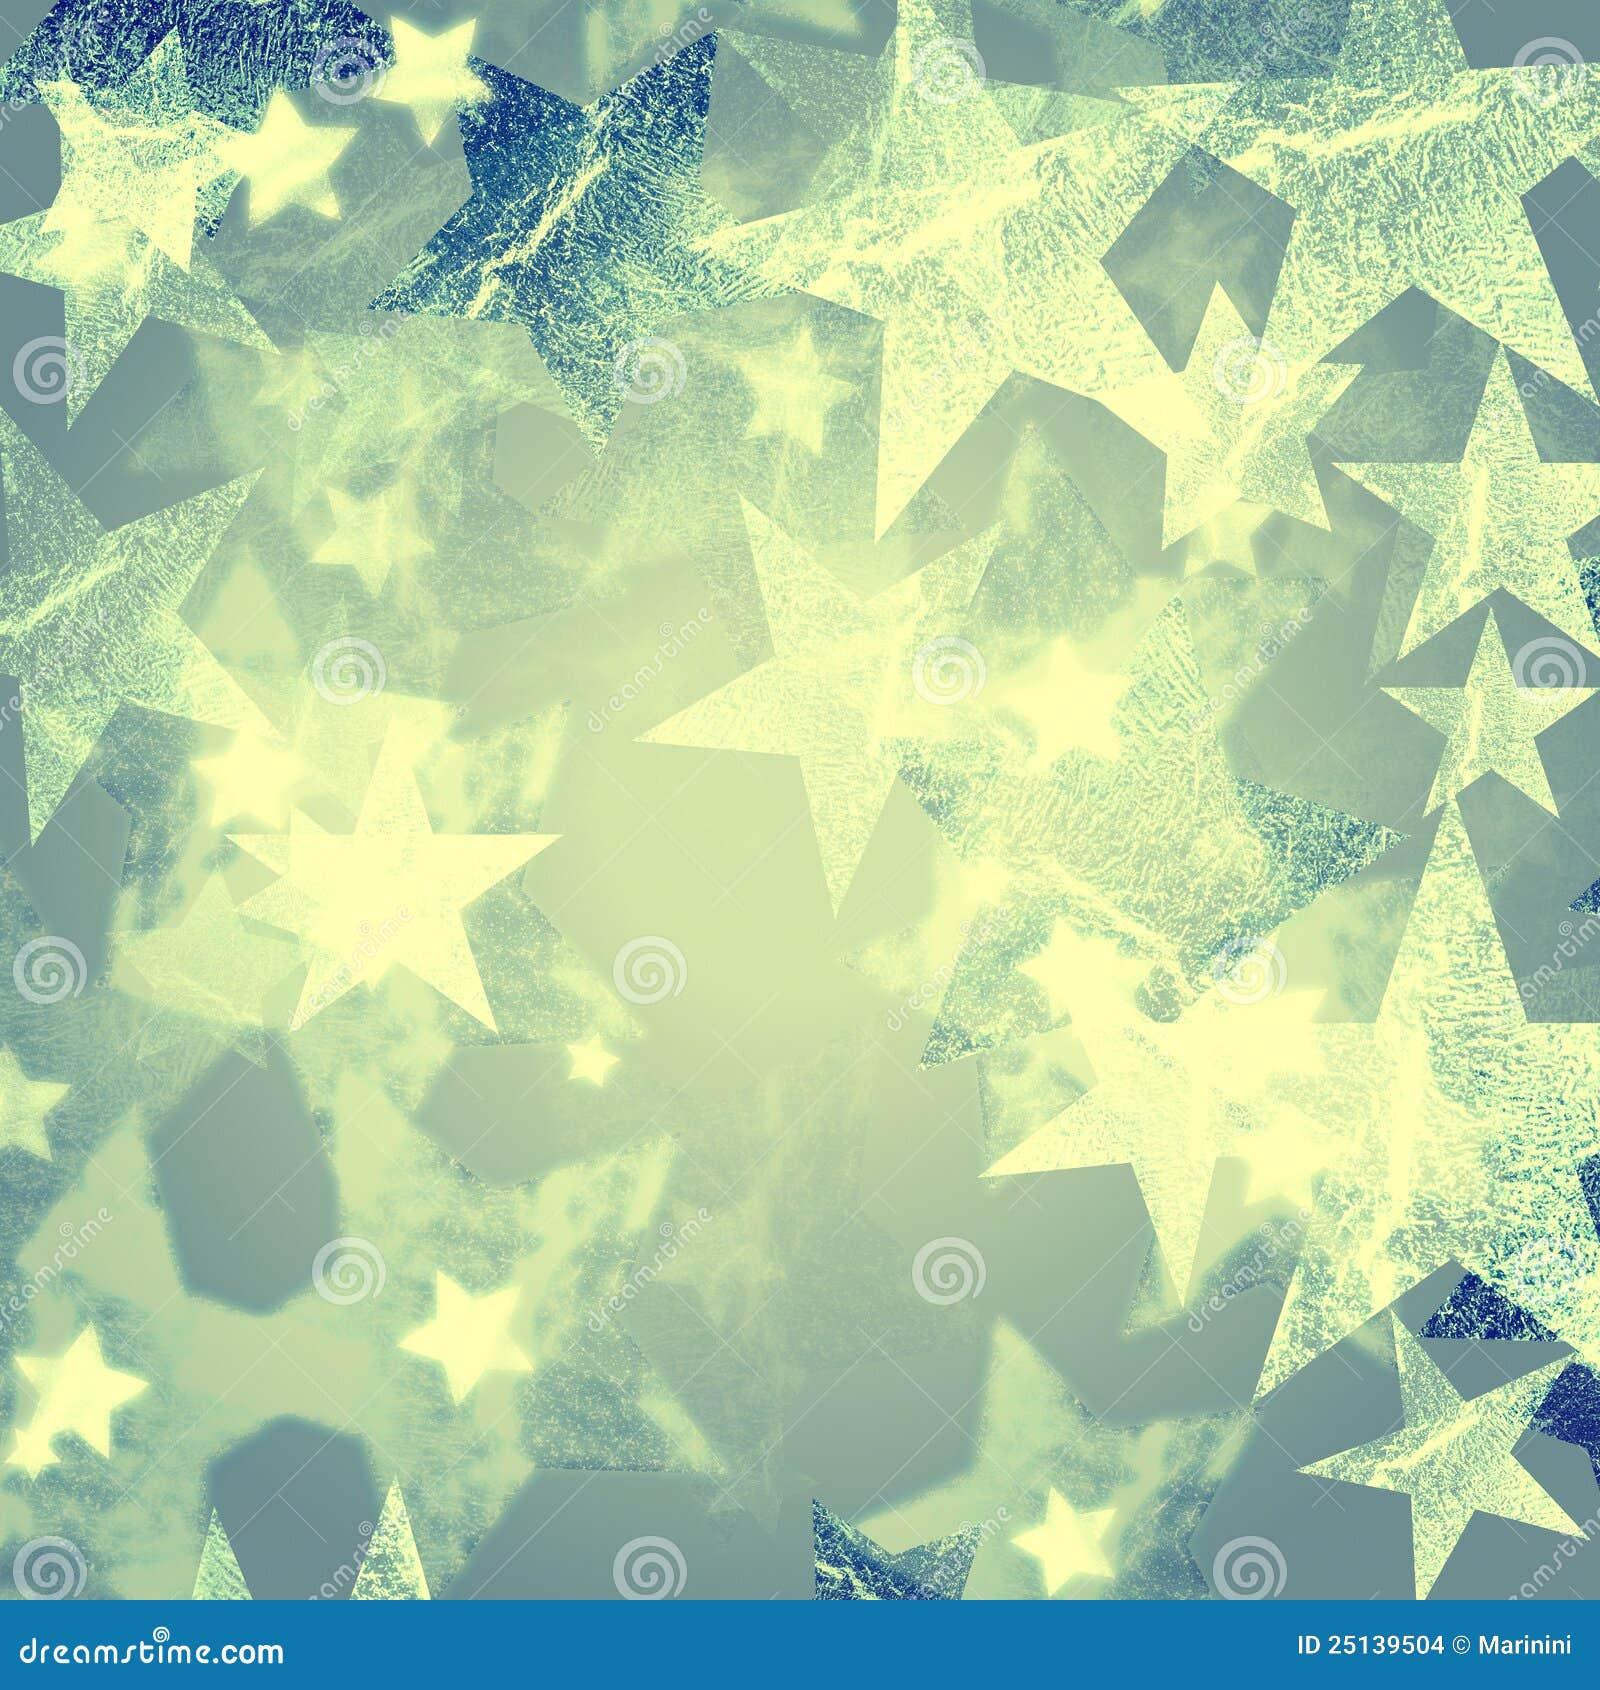 Vintage Stars Background Stock Images - Image: 25139504